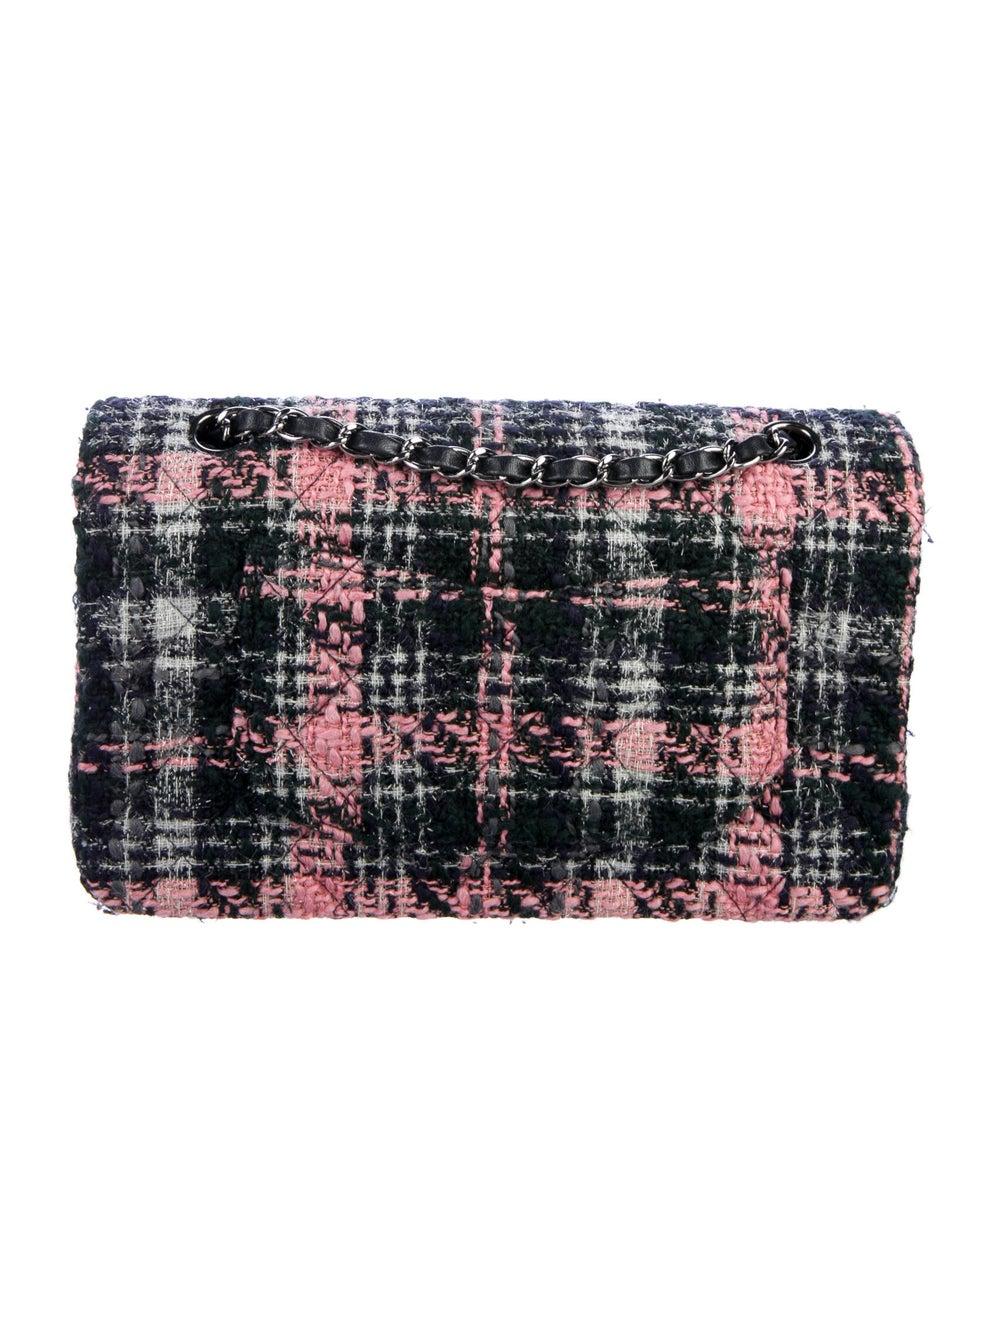 Chanel Medium Tweed Classic Double Flap Bag Blue - image 4